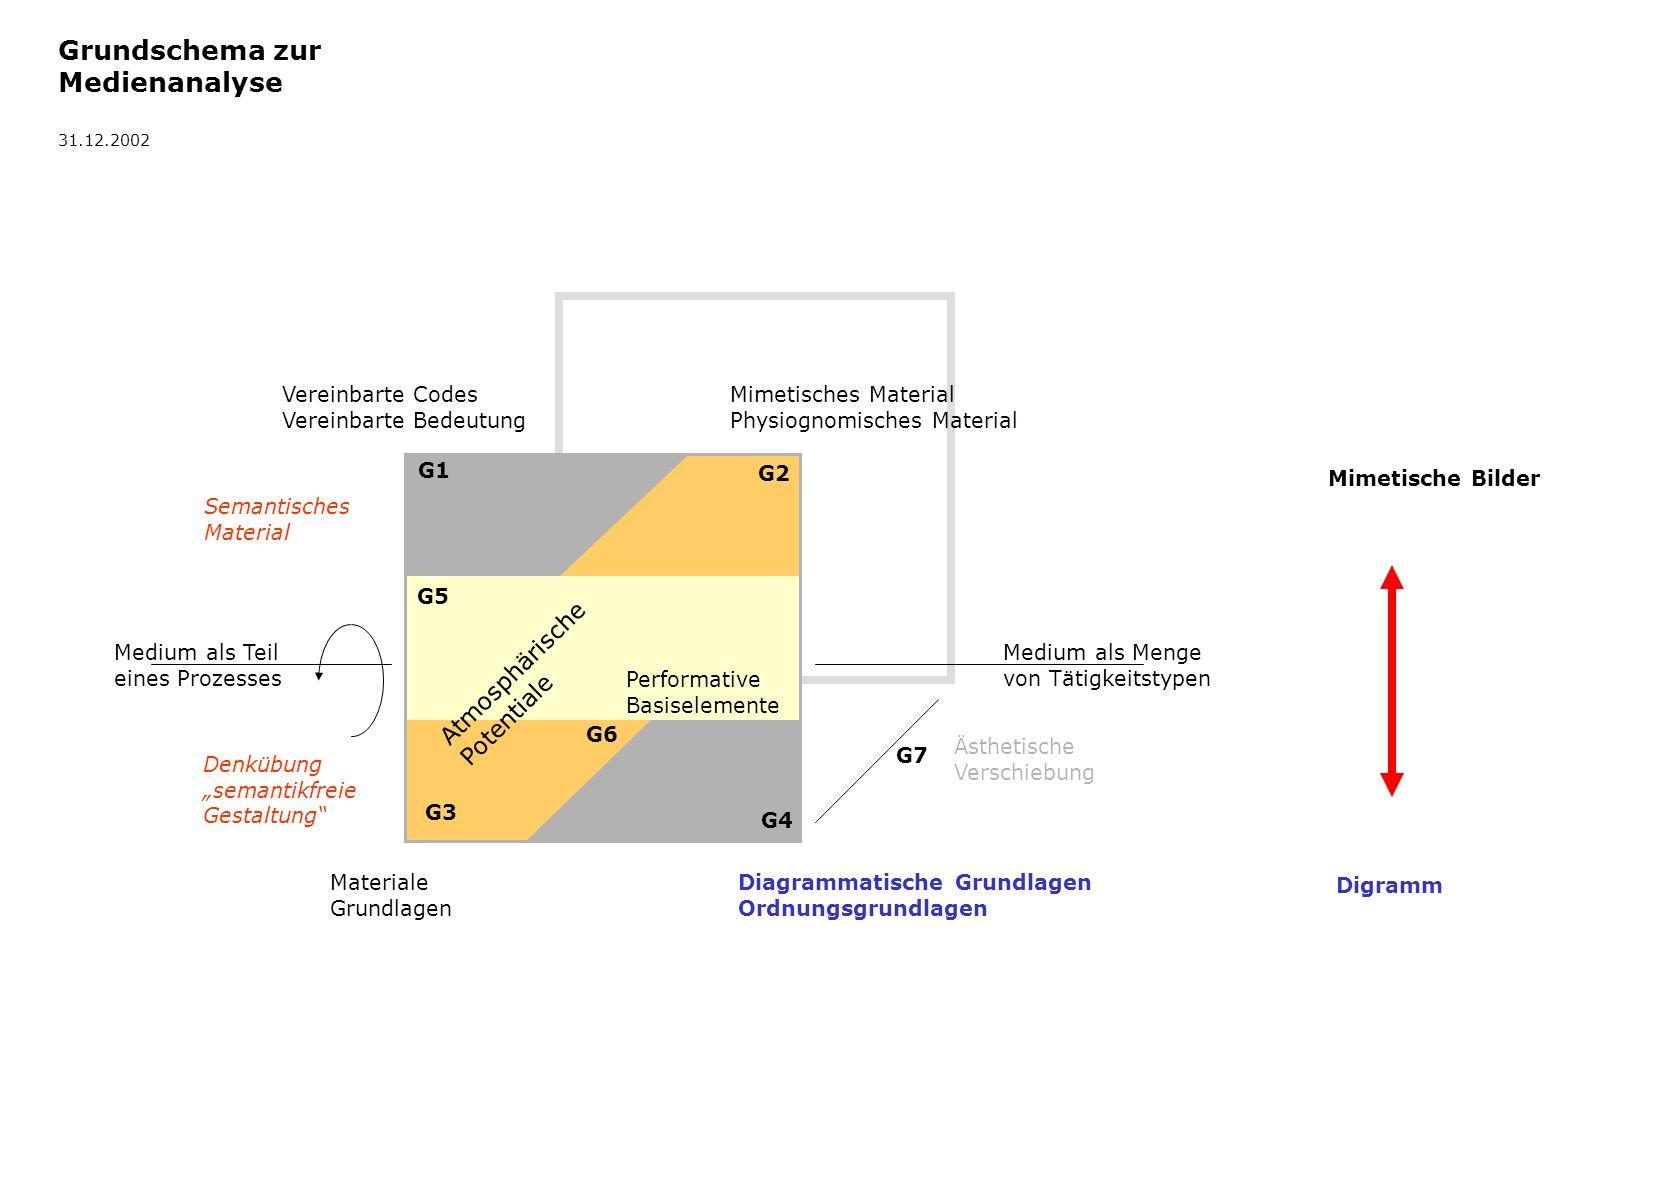 Mapping V Tableau (a), Tabelle 1.Phase der Ordnung Wahrnehmung Selektion (An)Sammlung Gruppierung (grob) Hervorhebung Ausstellung (Aneinander)Reihung Quantifizierung Tableau Mapping III (a) Karte Lagezusammenhang Geographische Karte Mapping III (b) Cluster, Tableau (b) 2.